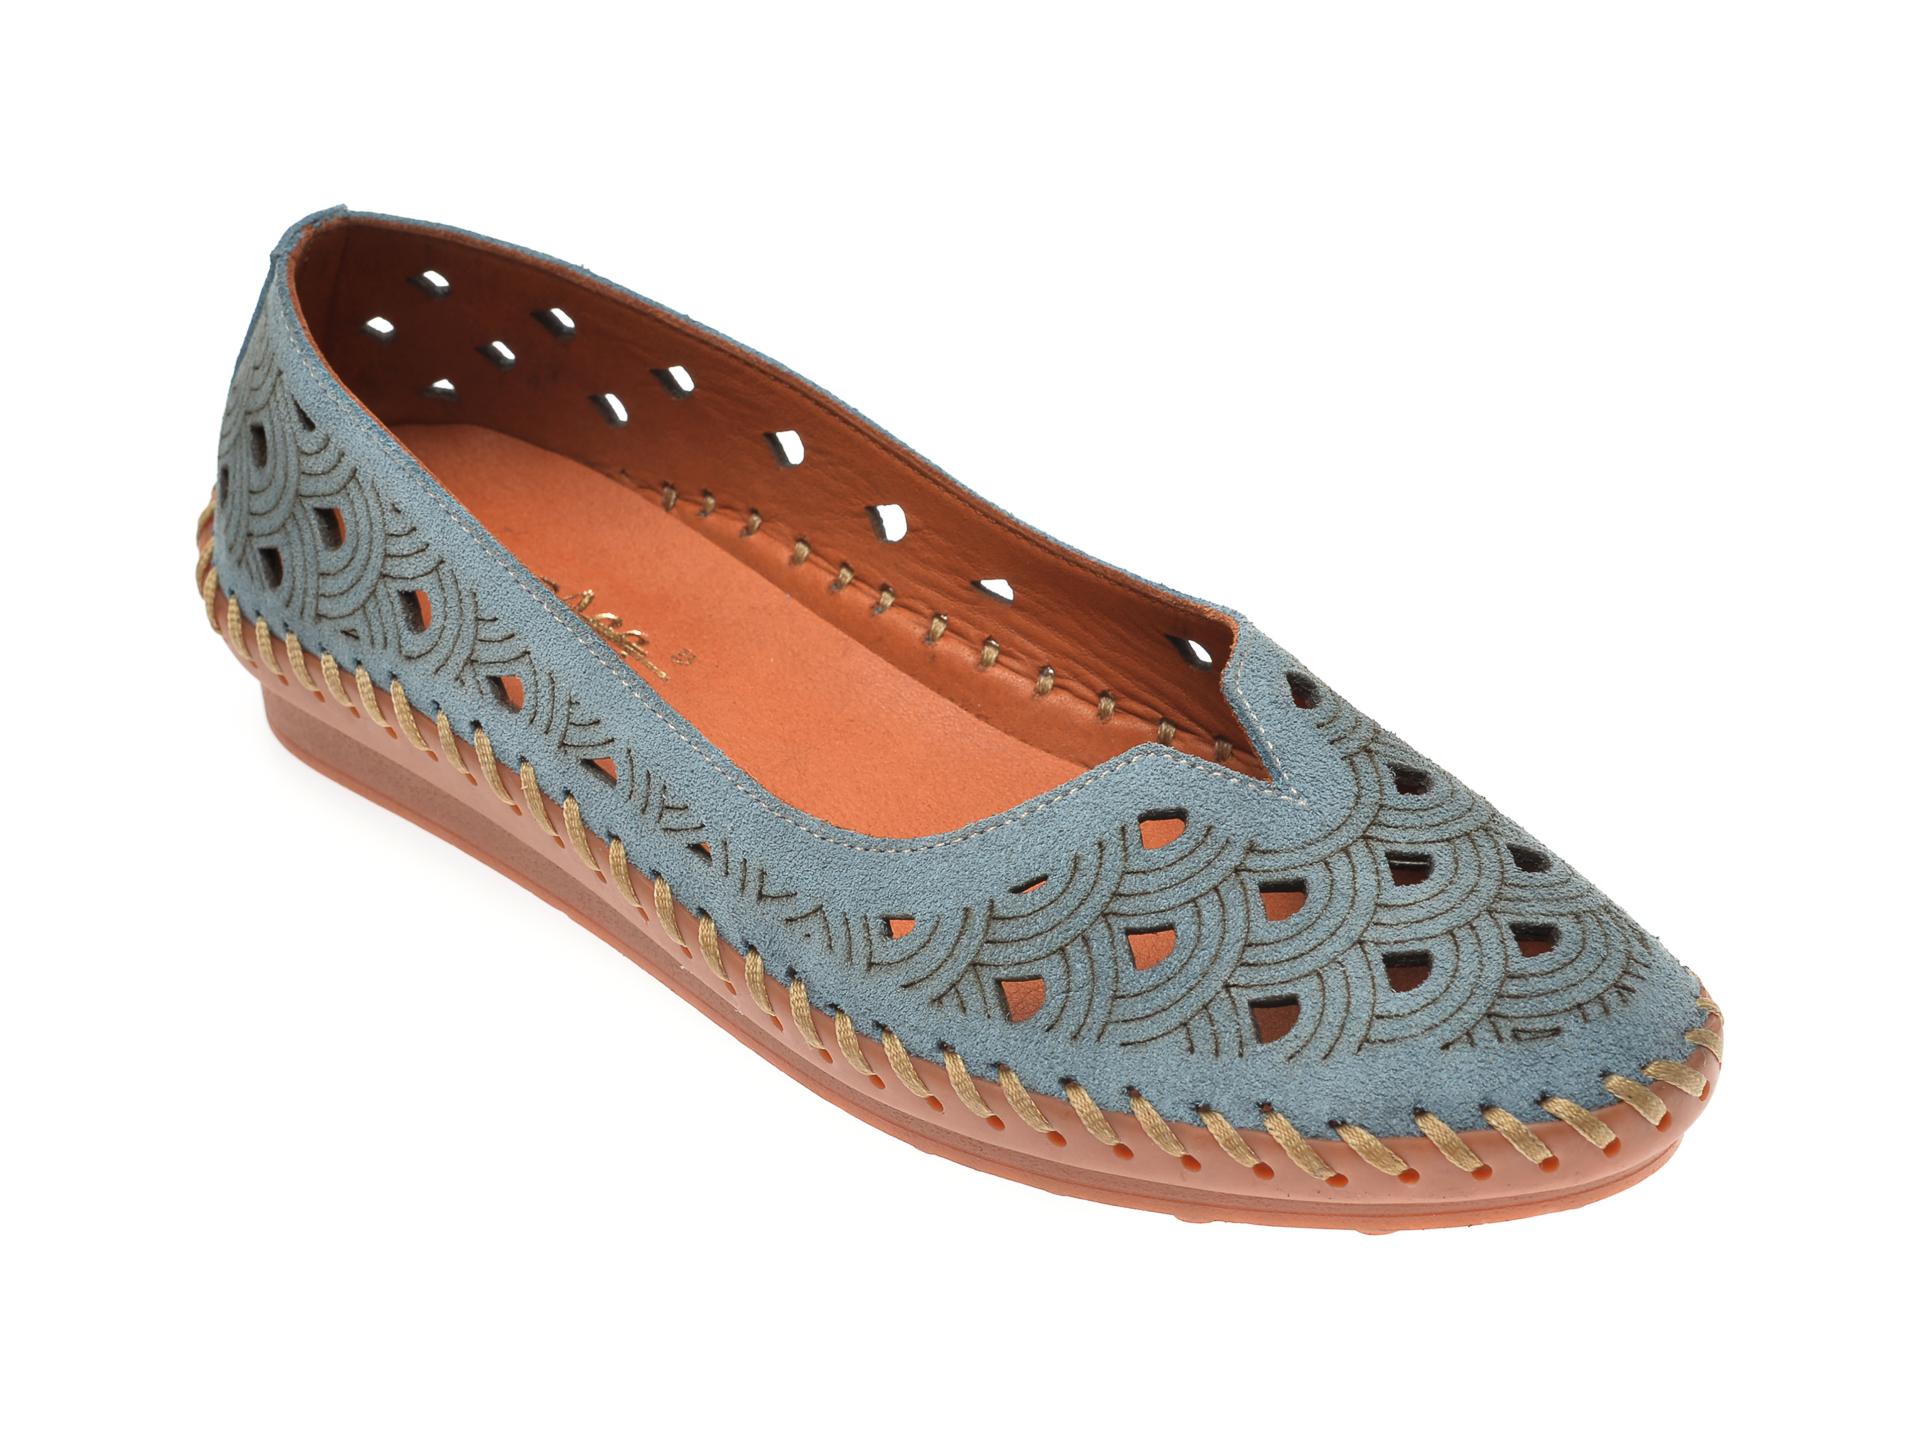 Pantofi PASS COLLECTION albastri, 02710, din piele intoarsa